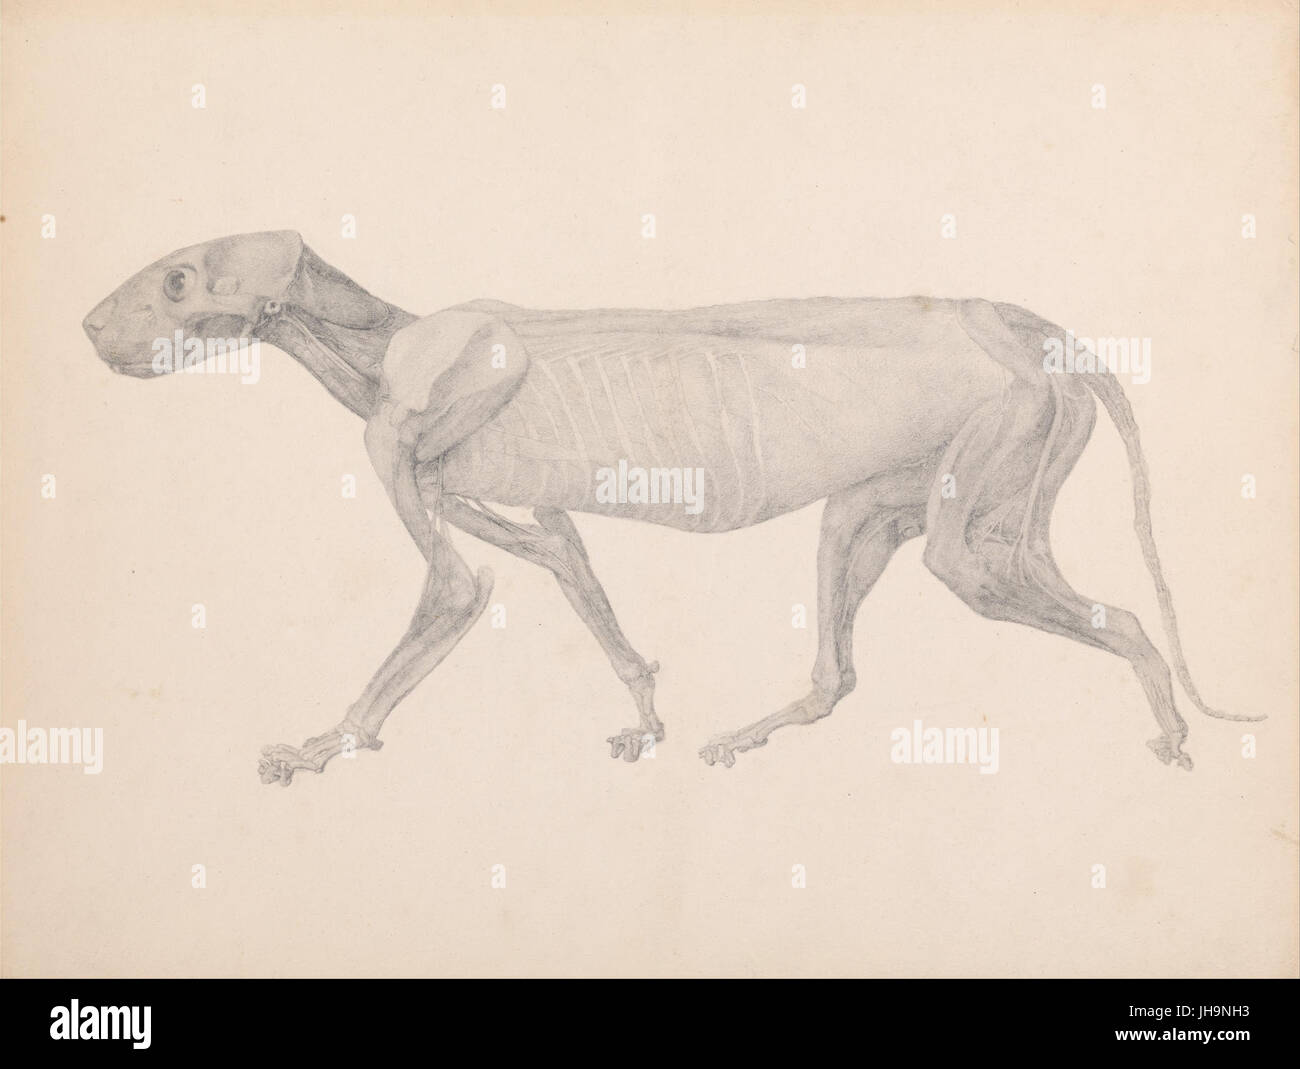 Line Drawing Of Body Stockfotos & Line Drawing Of Body Bilder ...